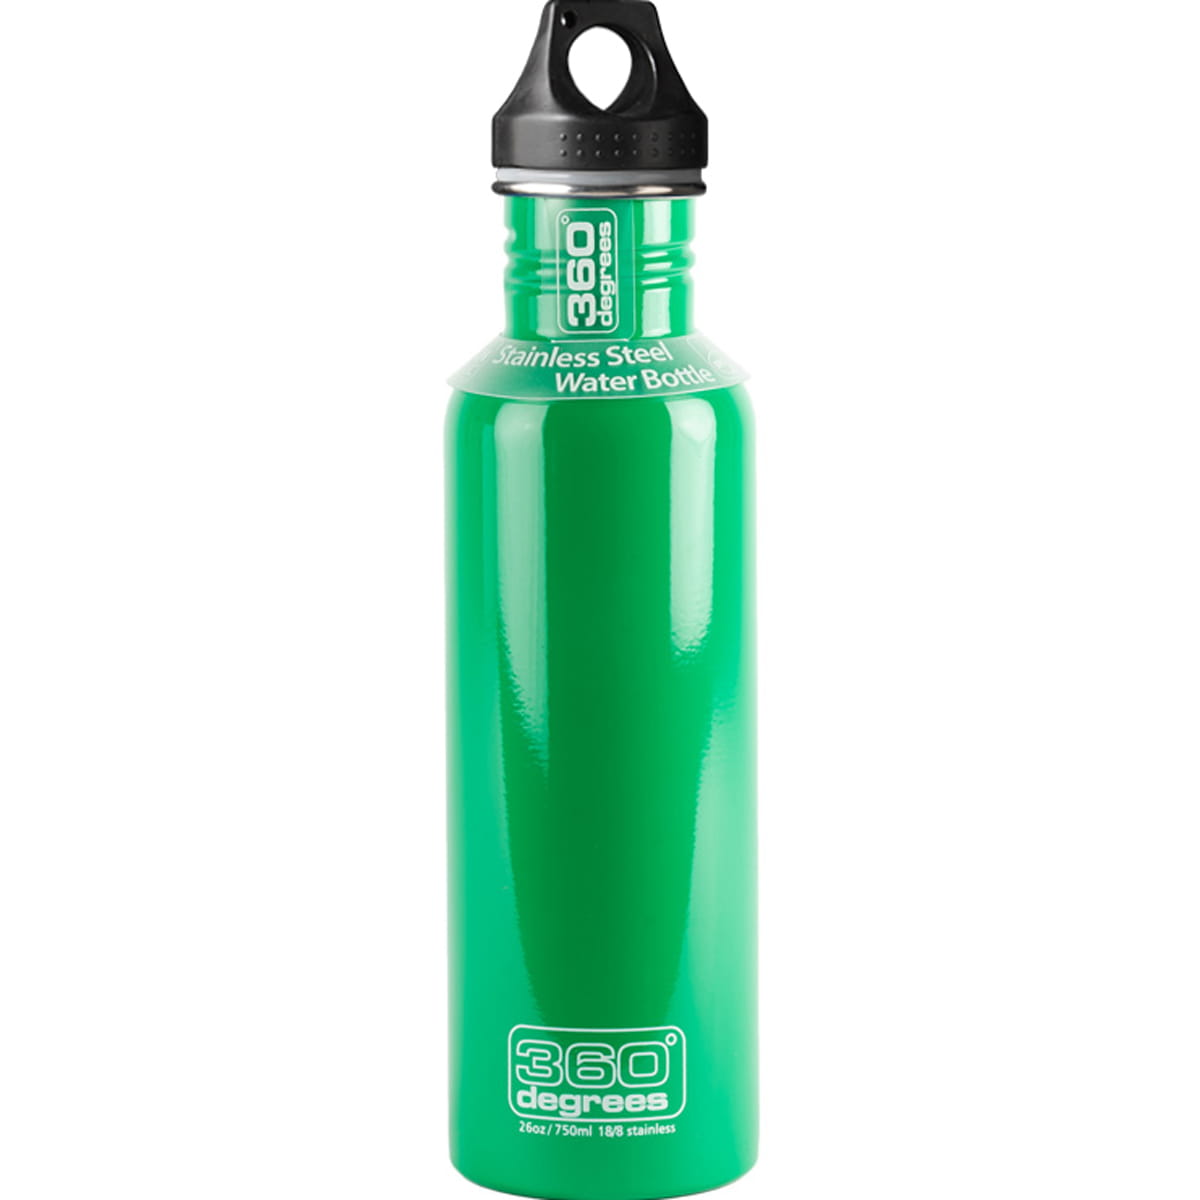 360° degrees Stainless Drink Bottle - 750 ml - Trinkflasche spring green - Bild 7